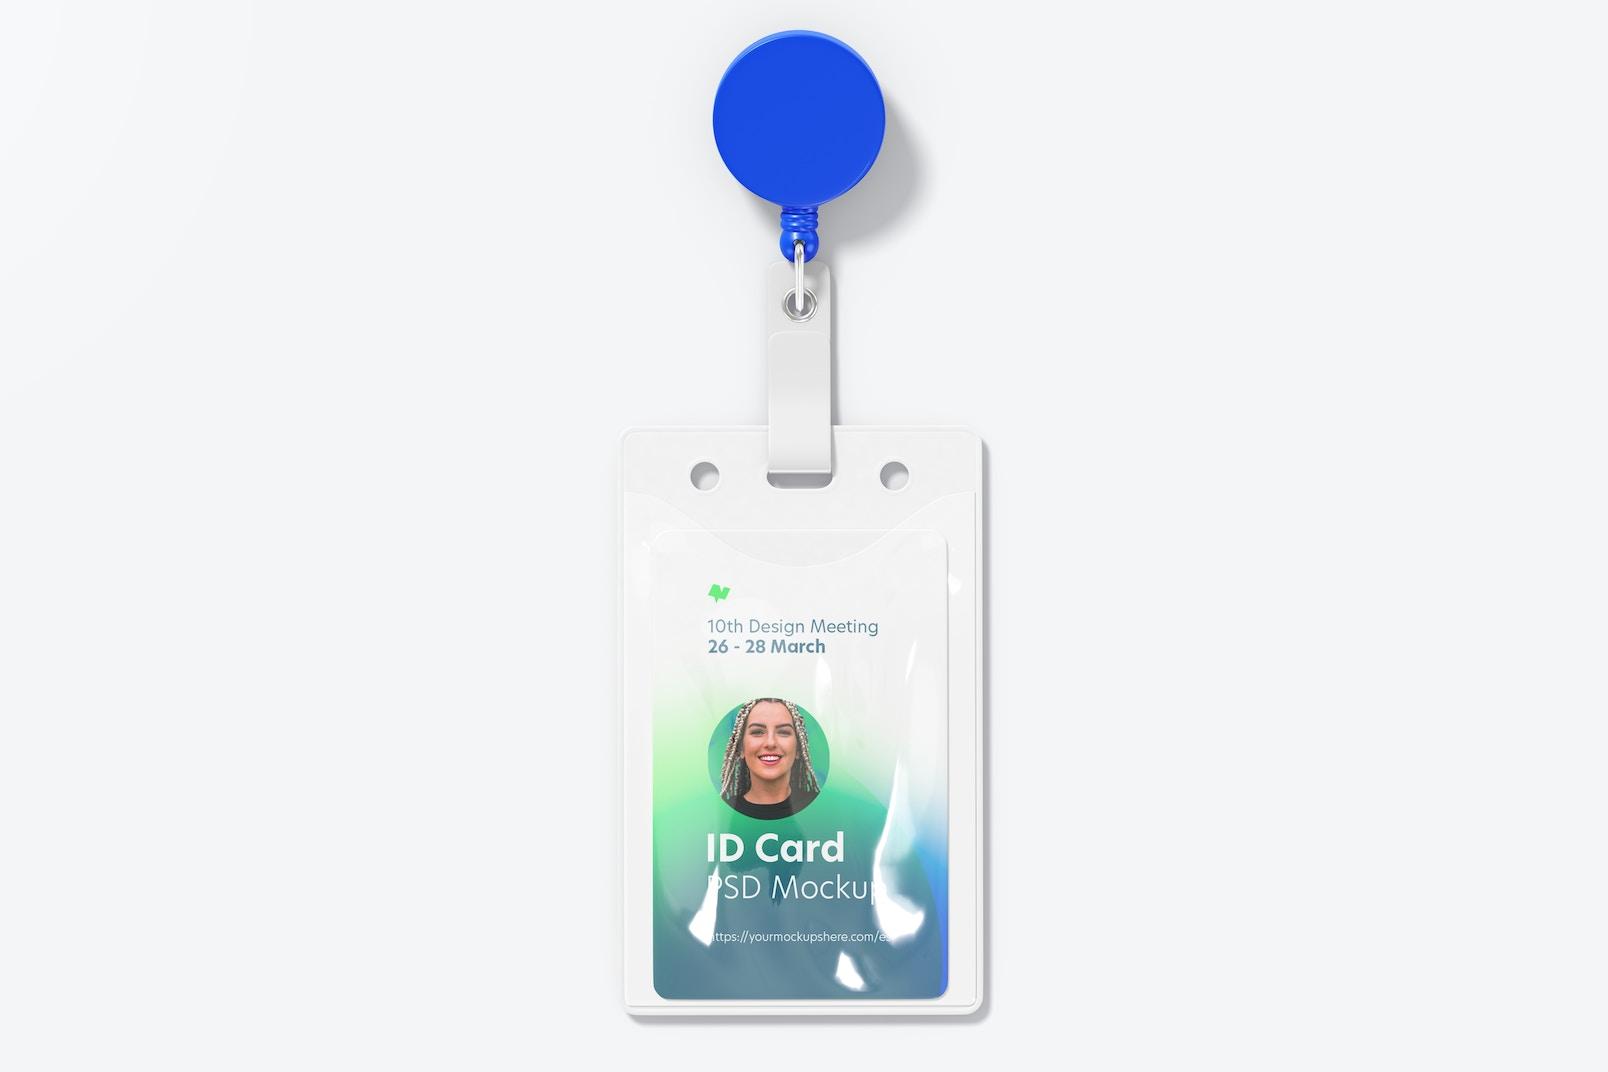 ID Card Reel with Belt Clip Mockup